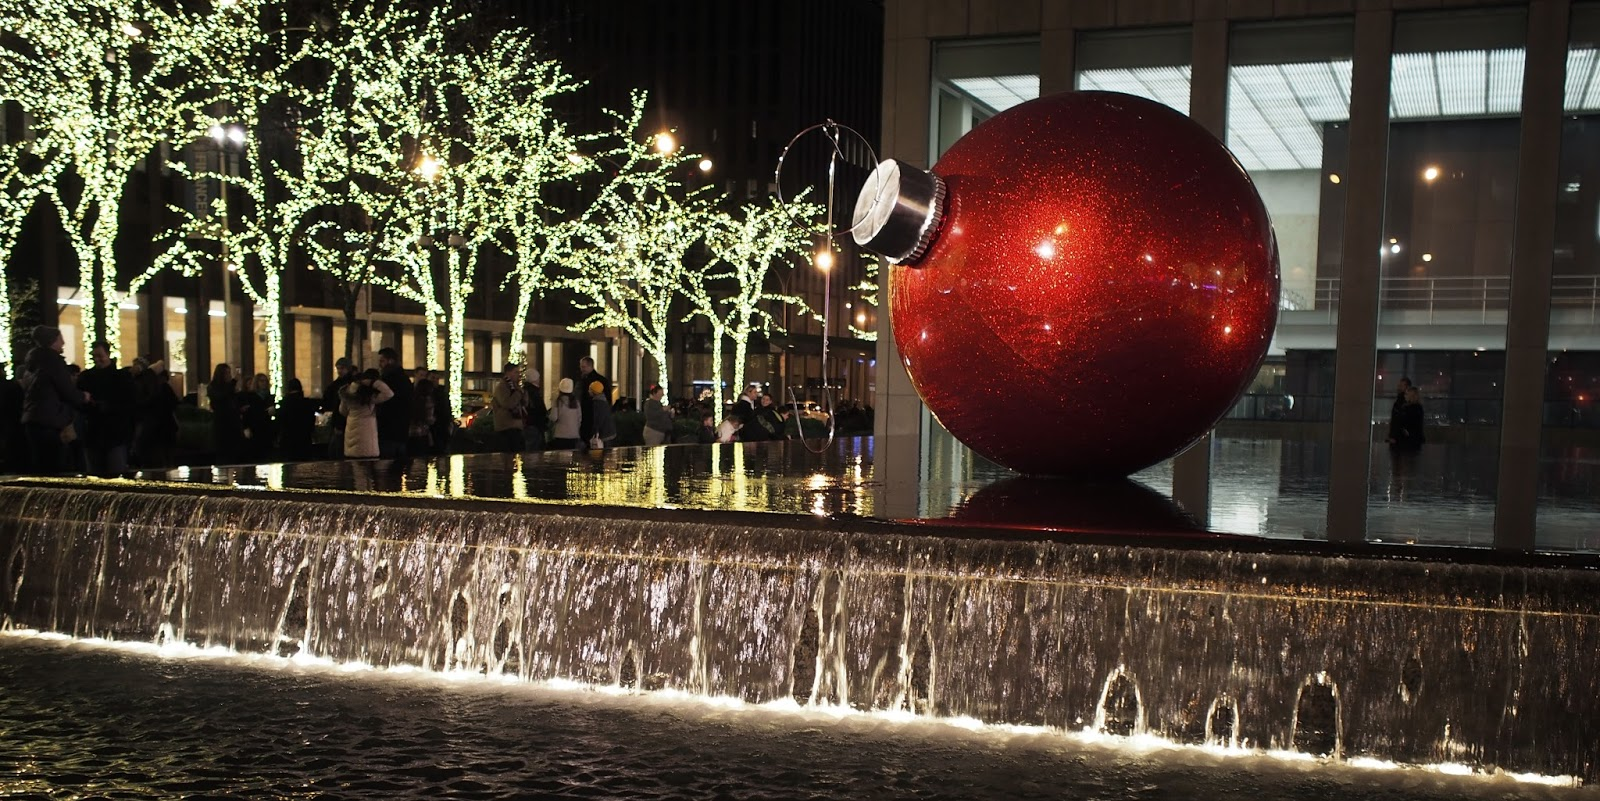 Stray Ornament #strayornament #holidays #besttimeoftheyear #nyc ©2014 Nancy Lundebjerg